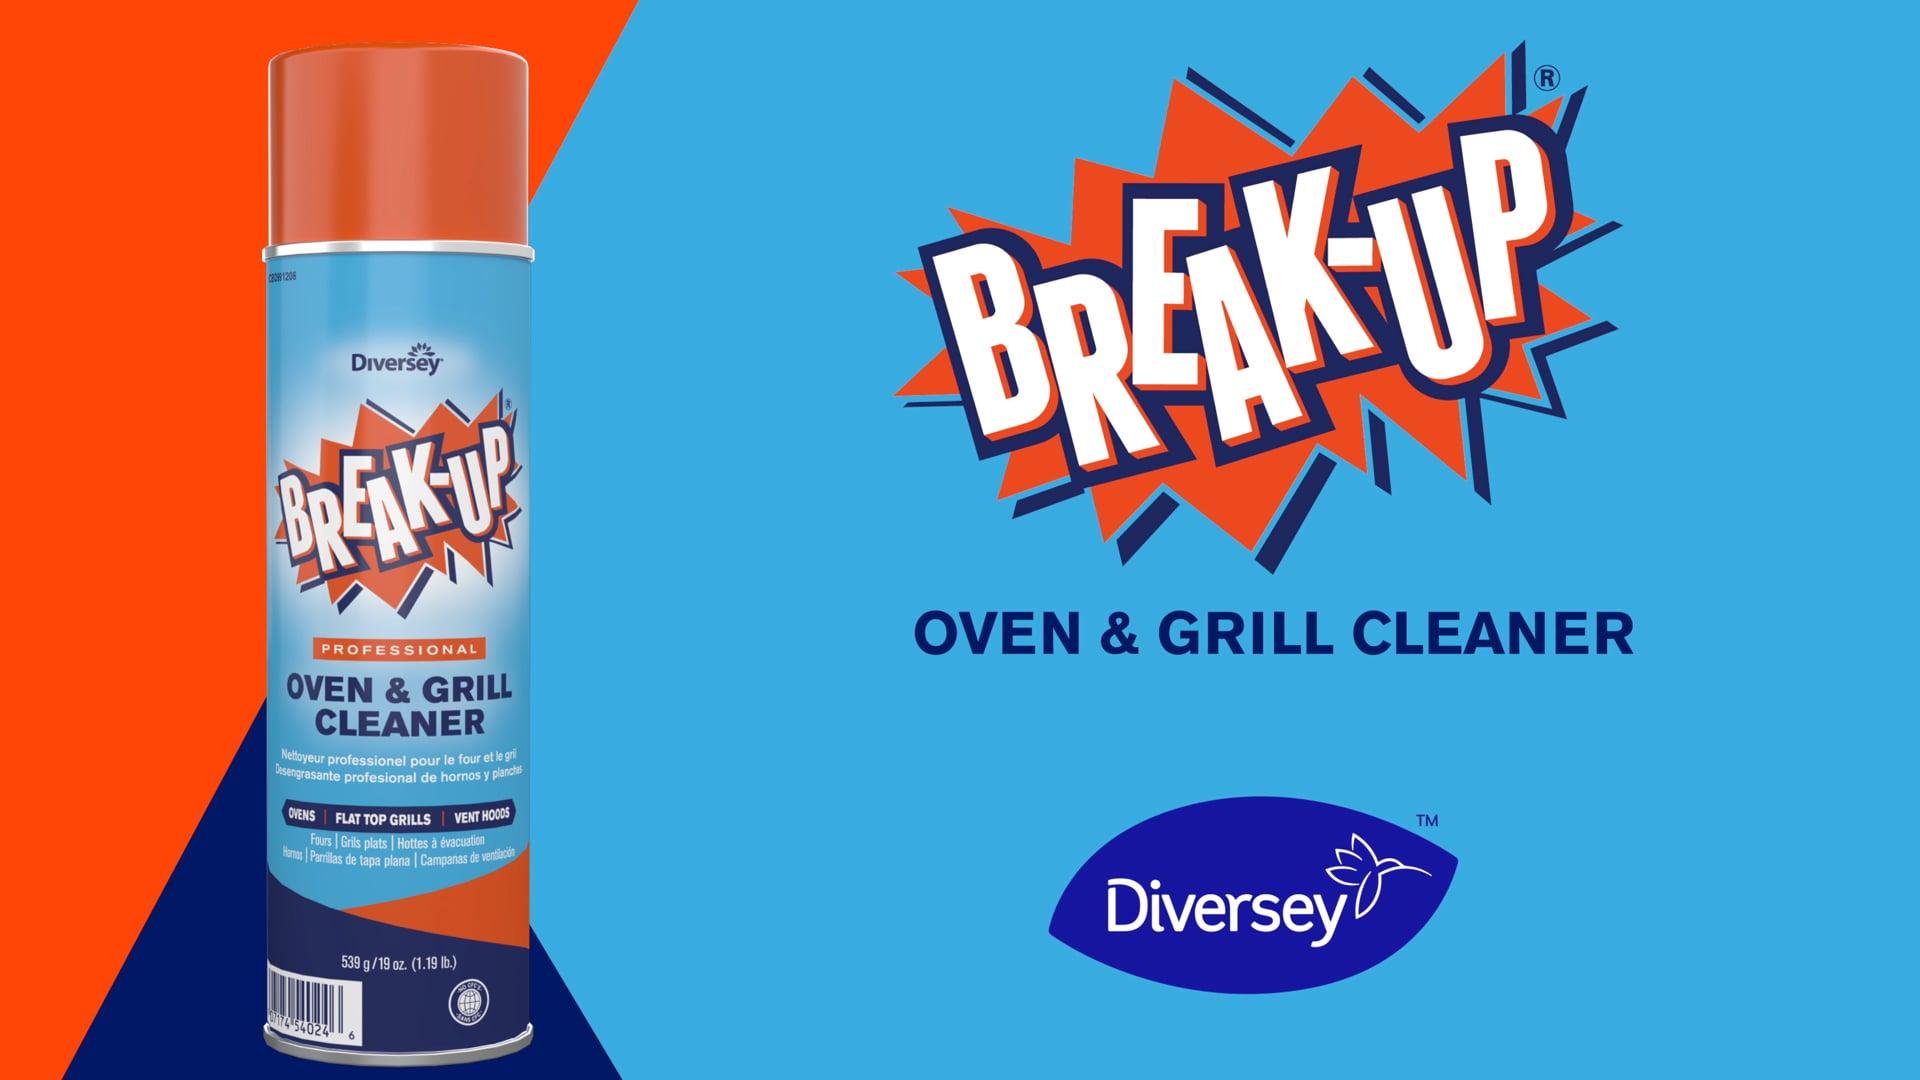 Break Up | Professional Oven & Grill Cleaner | Diversey Brands